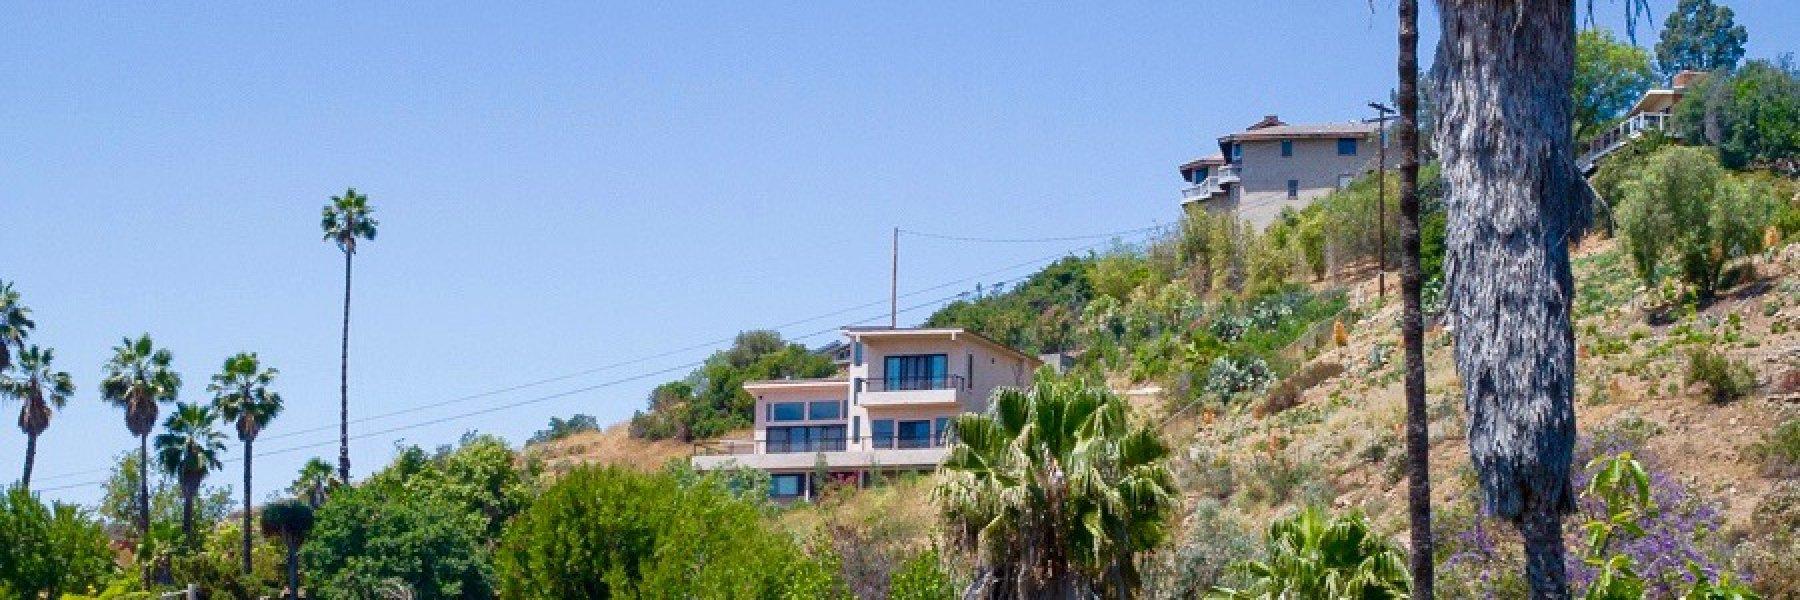 Calavo Gardens is a community of homes in La Mesa California